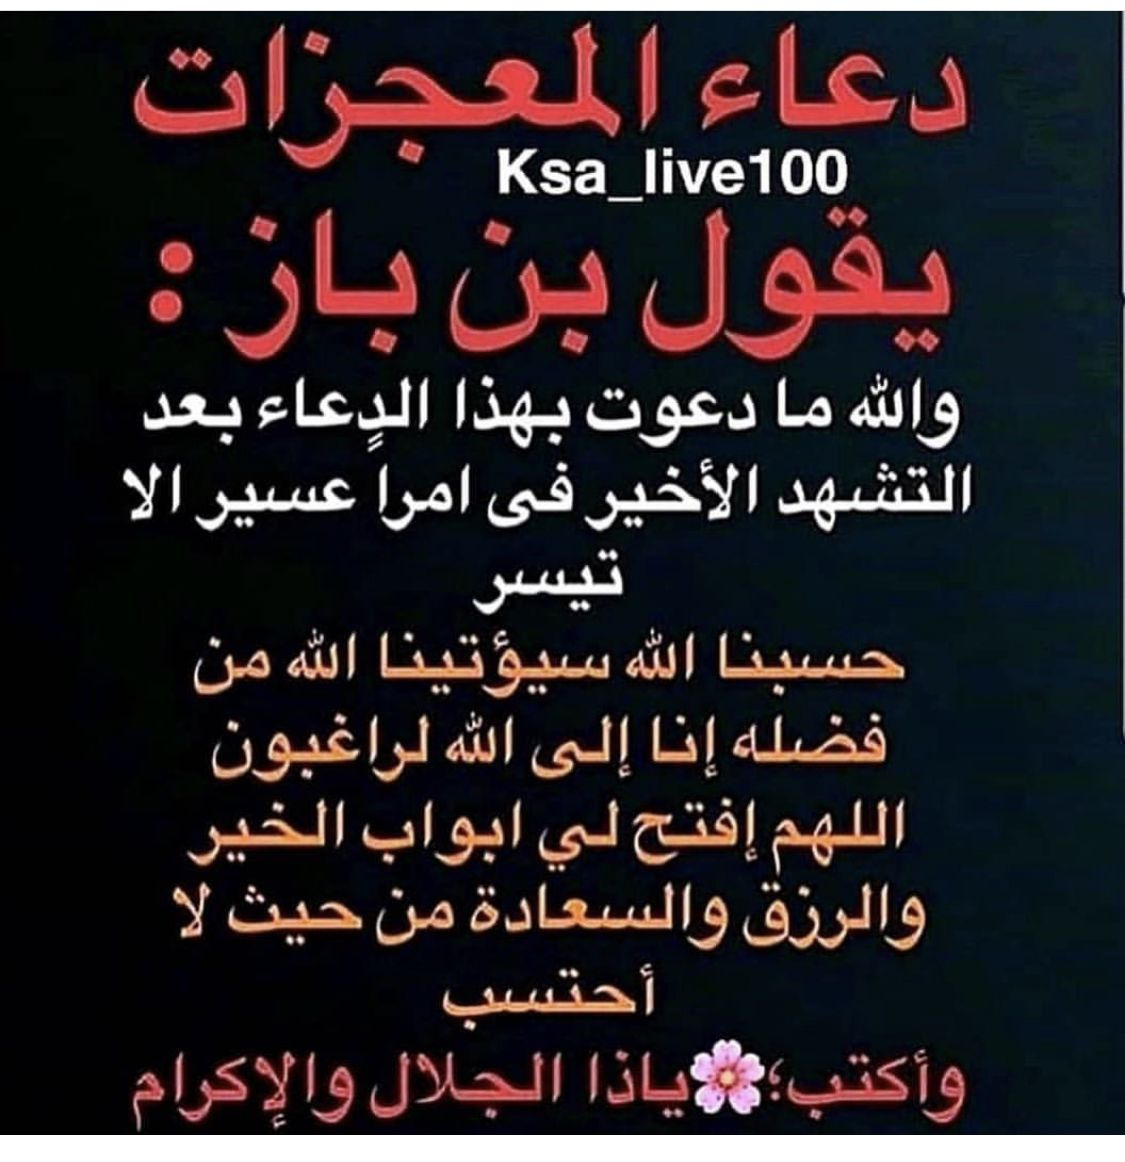 Pin By Sameh Alkahwagy On دعاء المعجزات Duaa Islam Islam Facts Islam Beliefs